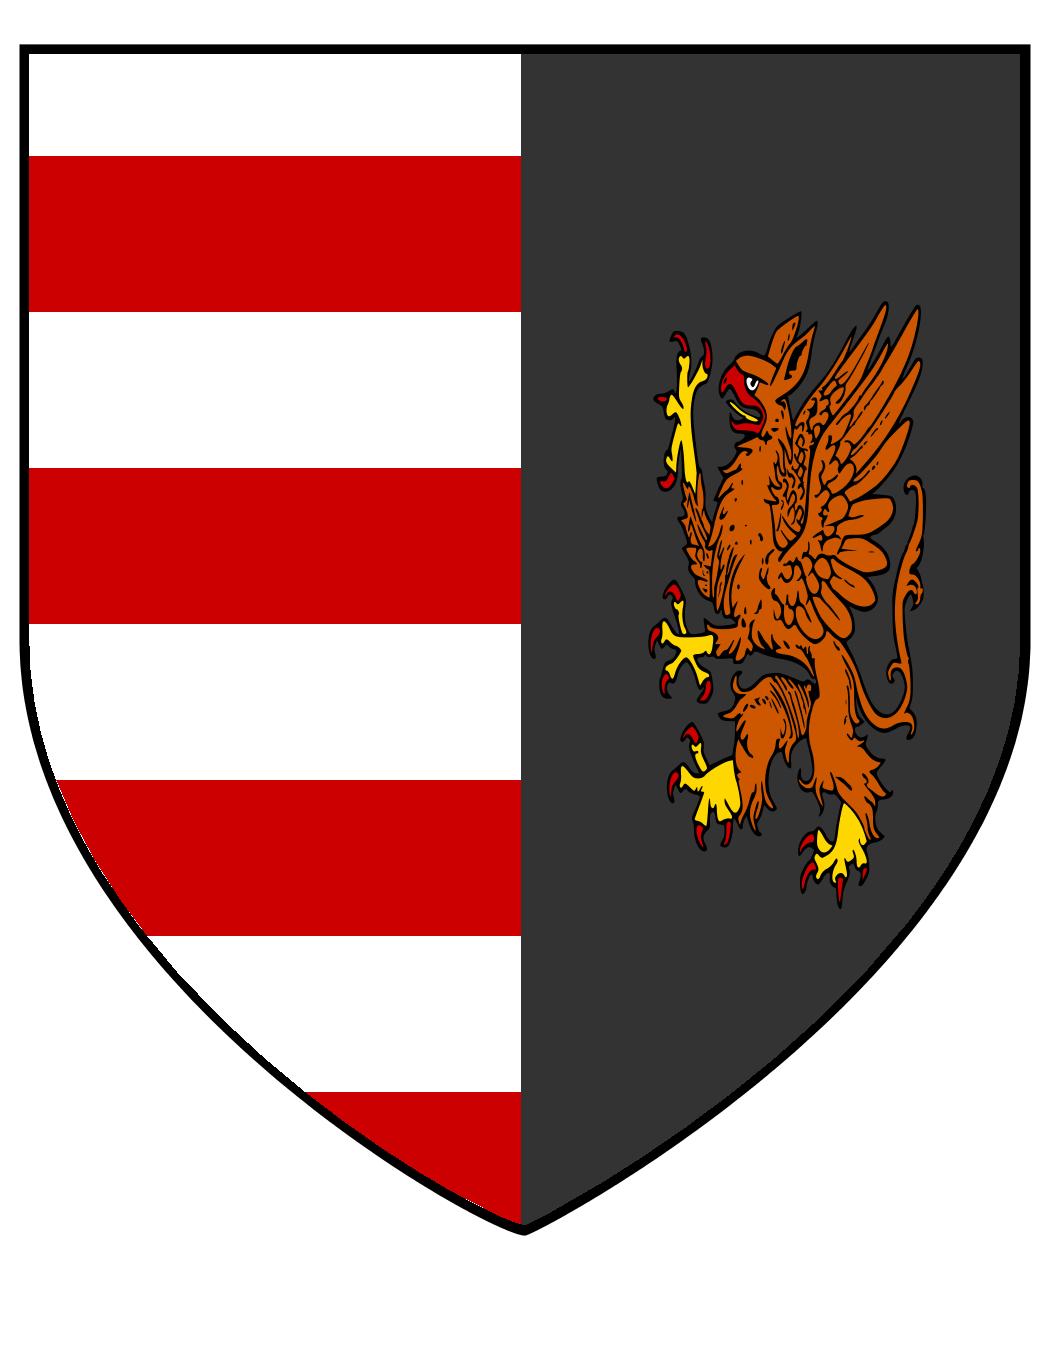 Coat_of_Arms_Wiprecht_von_Lubben.png